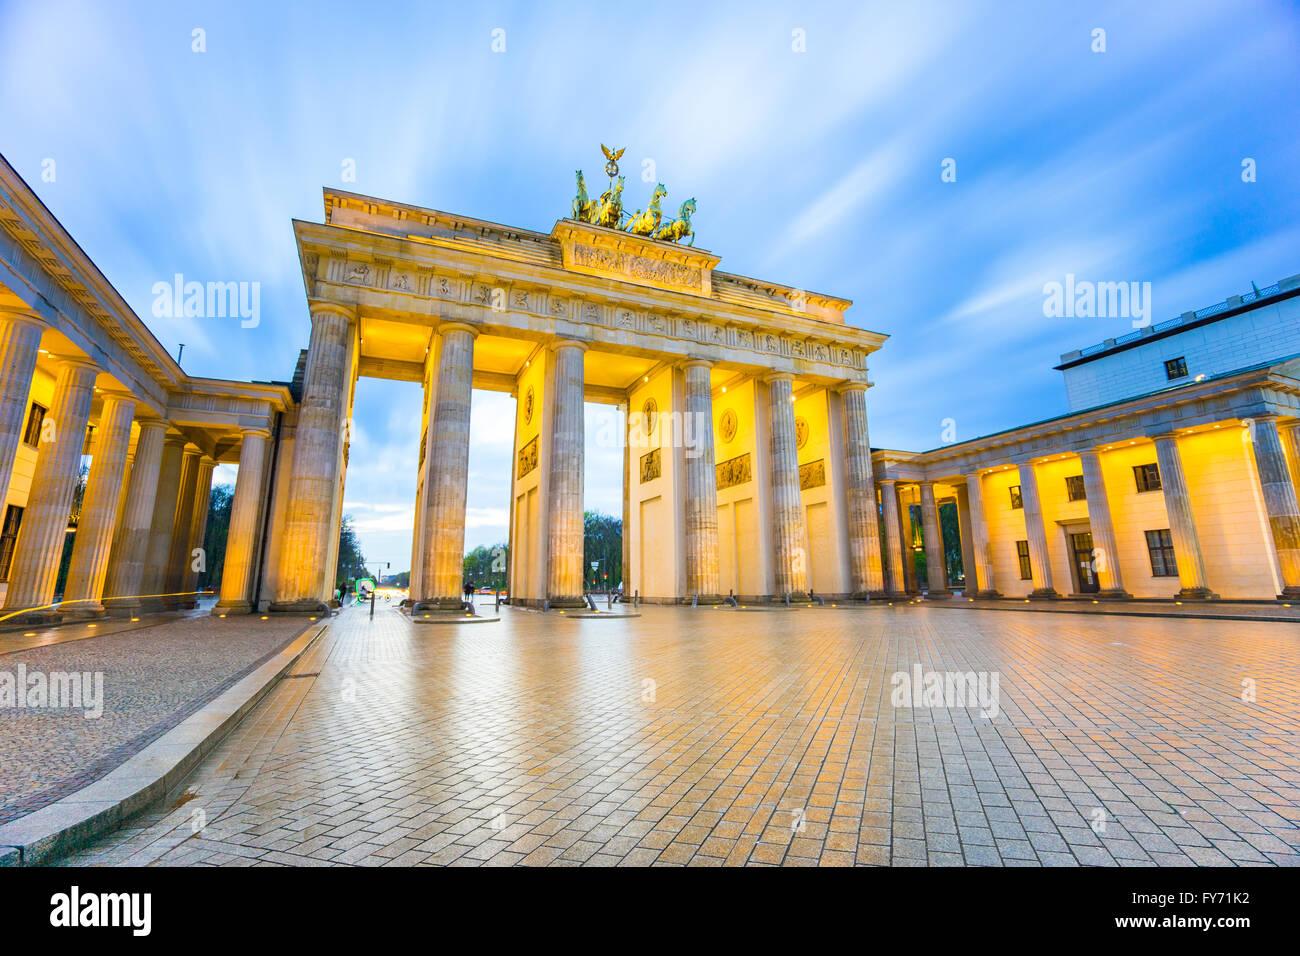 Brandenburger Tor (Brandenburg Gate) in Berlin Germany at night. - Stock Image